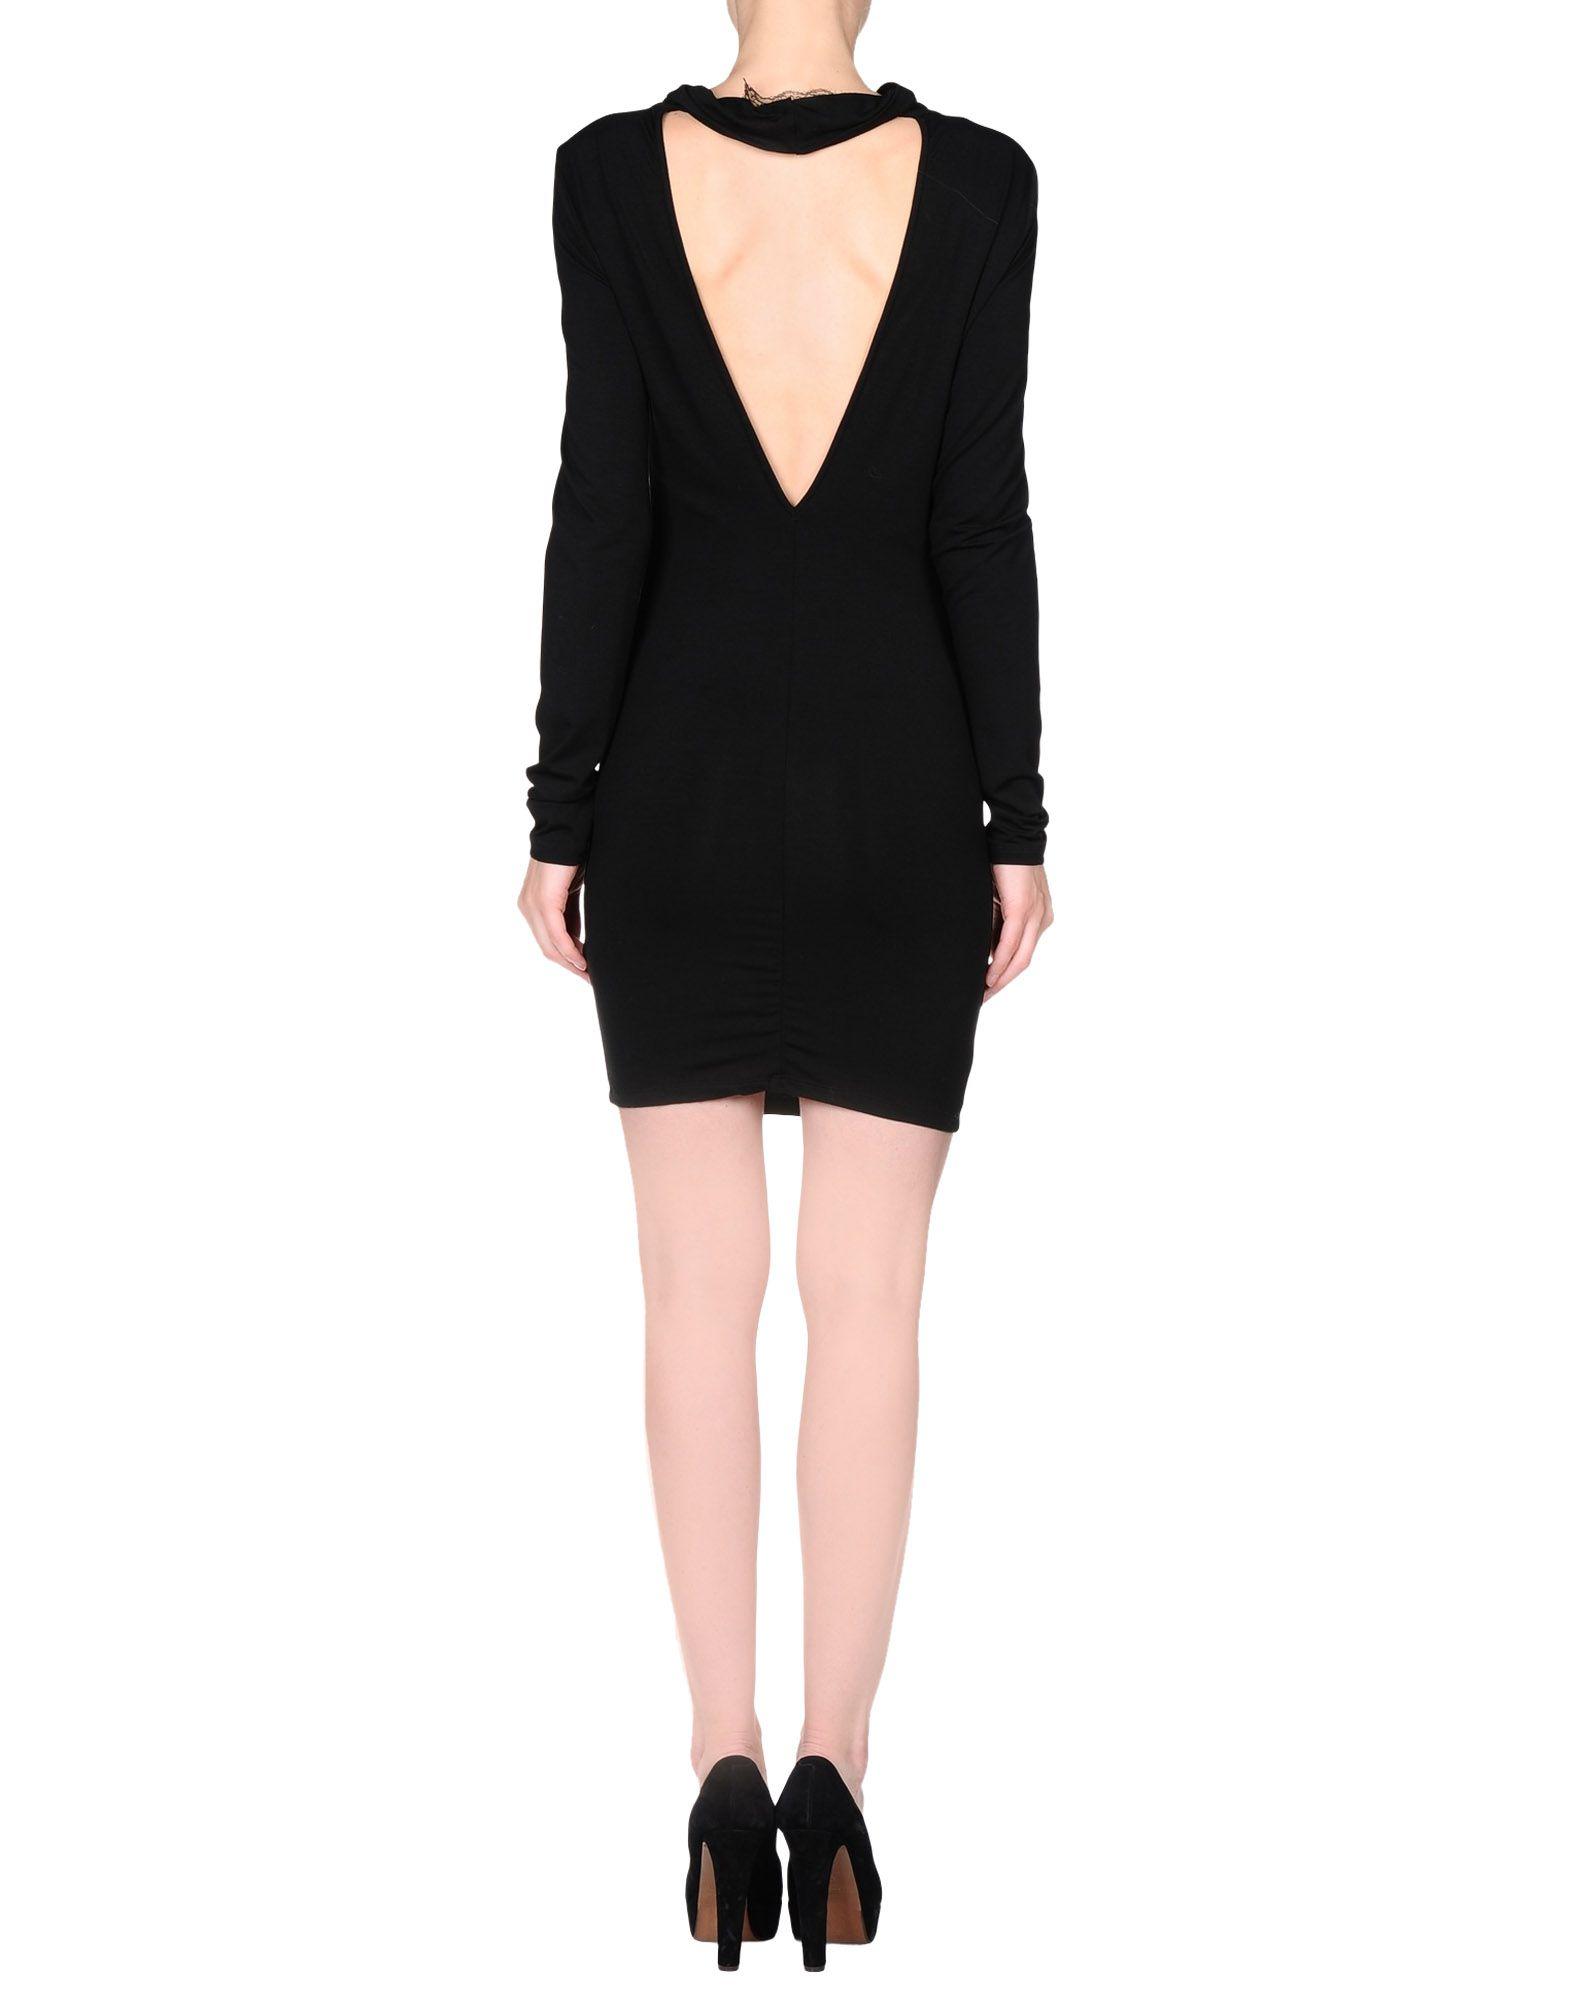 6a542c015e Lyst - Patrizia Pepe Short Dress in Black